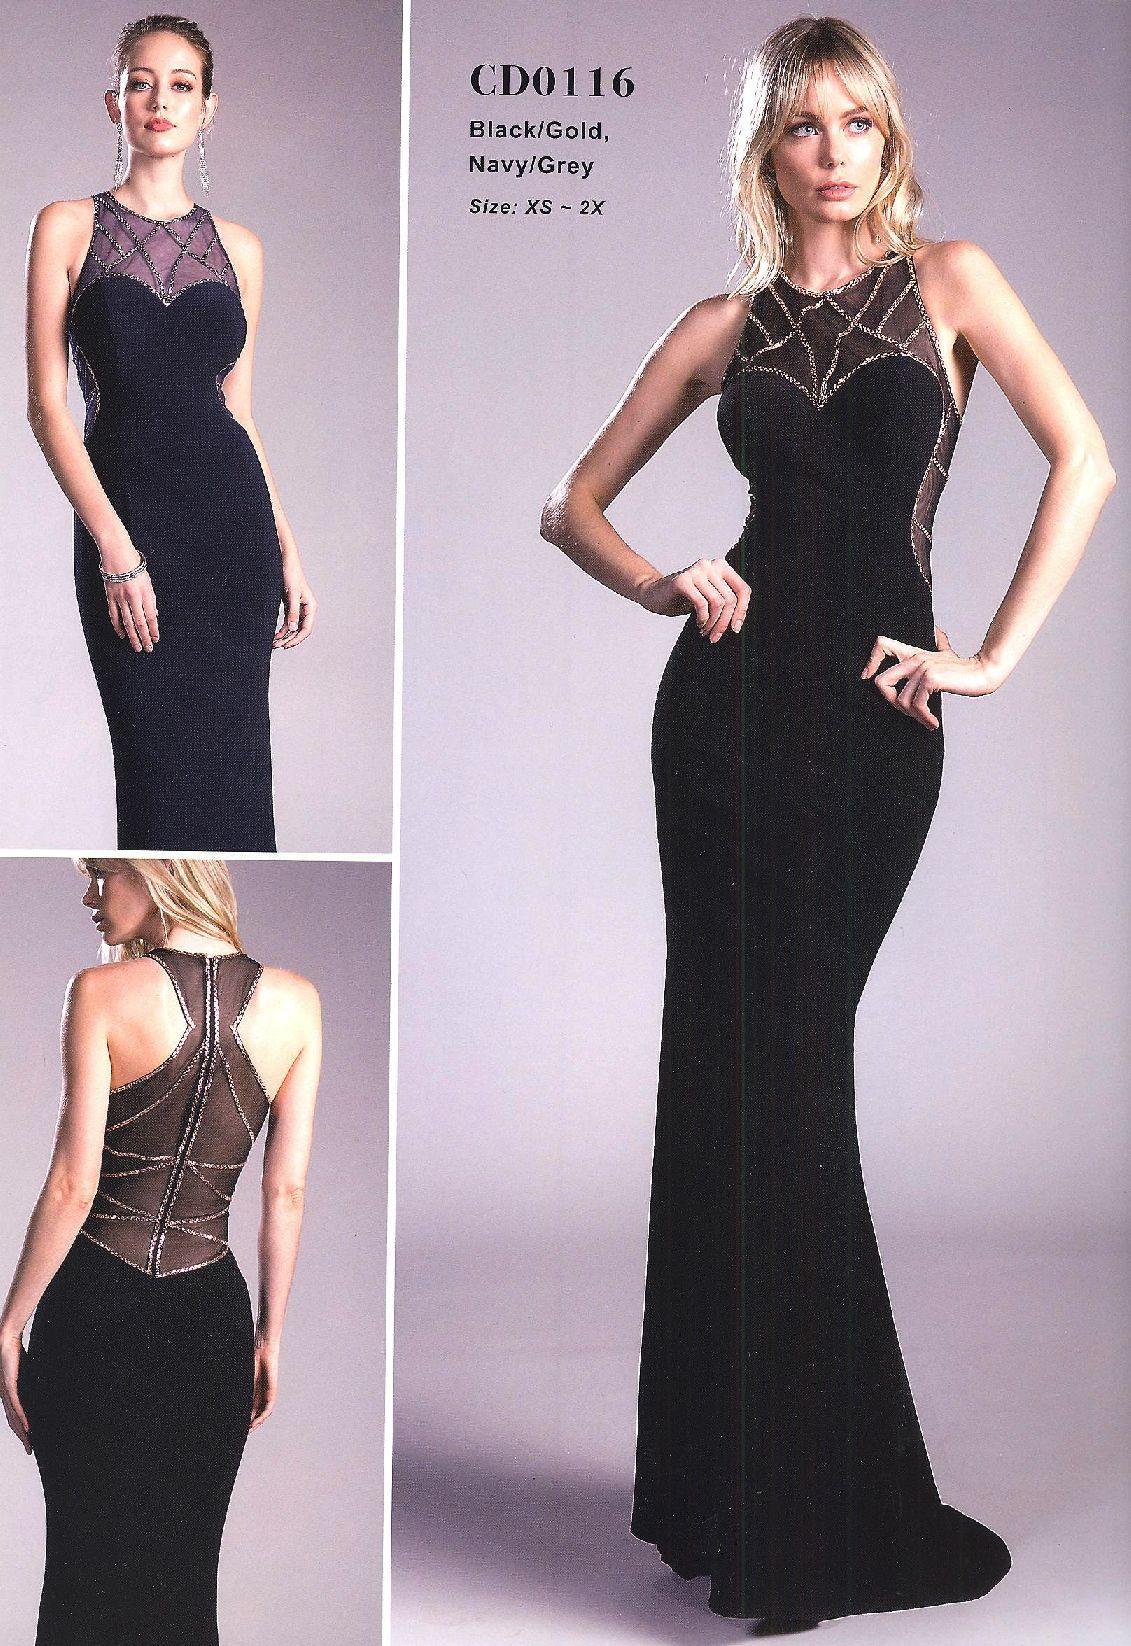 Prom dresses evening dresses by cinderellaucbrueaddcducbruejewel